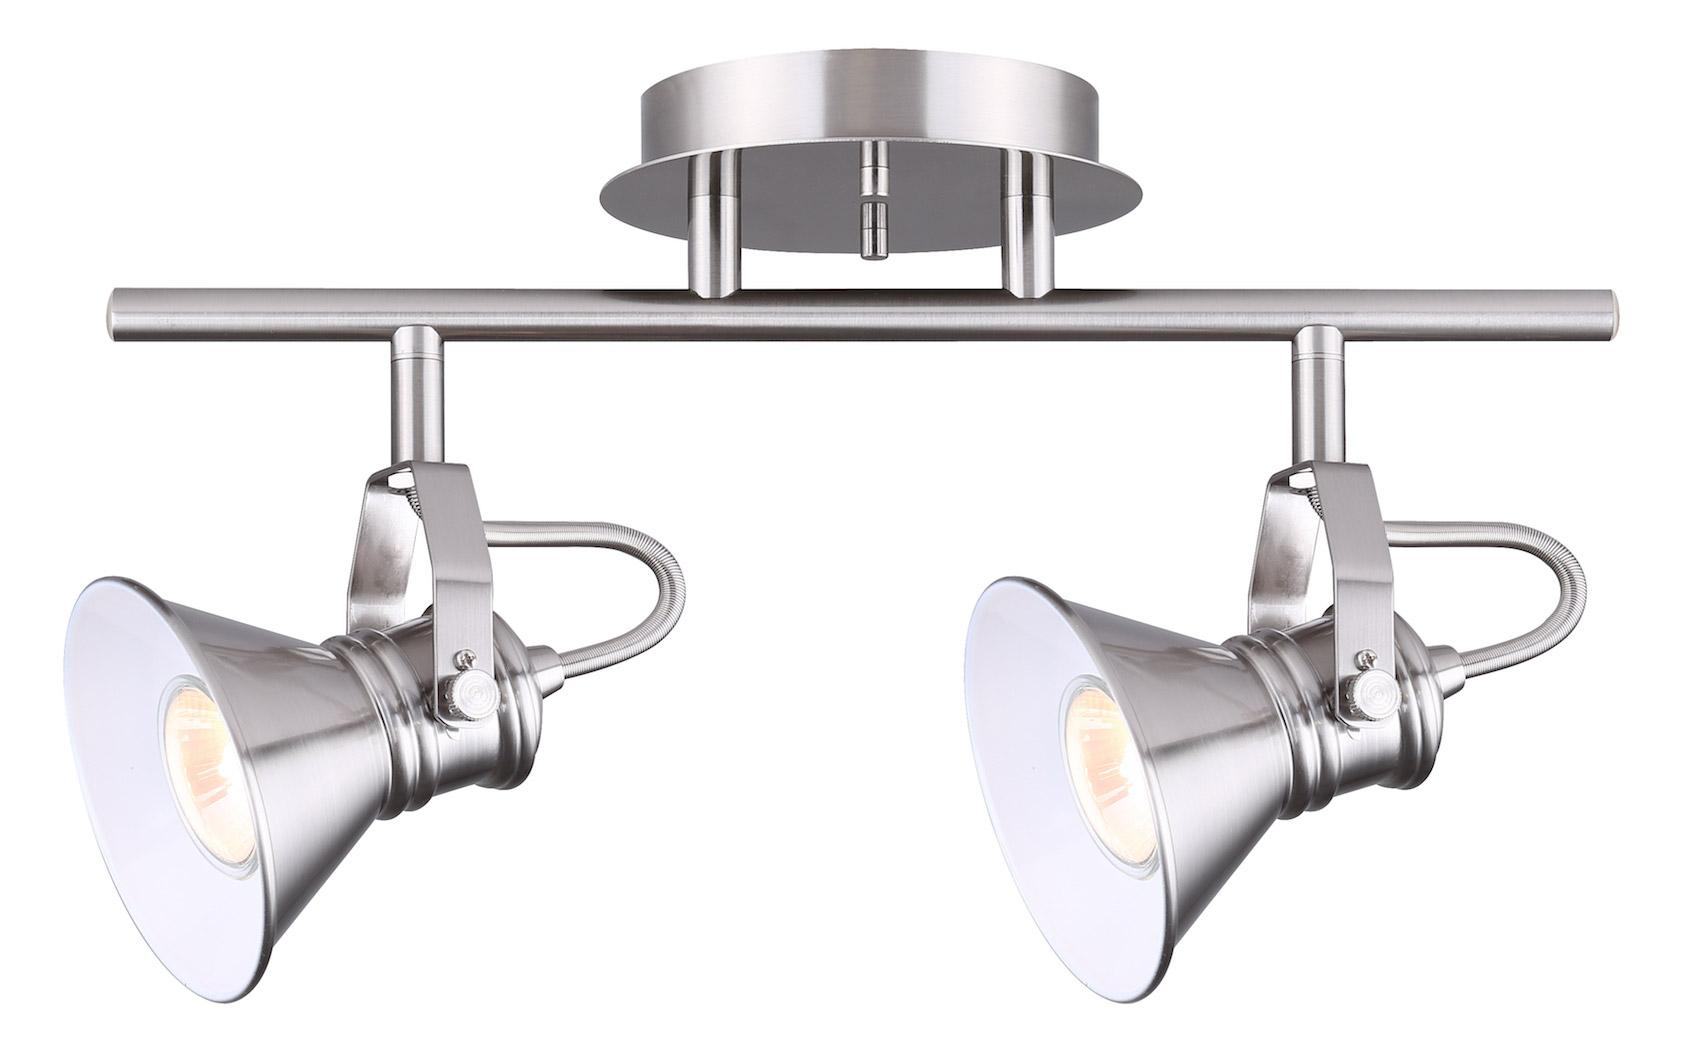 luminaire sur rail dirigeable morocco it582a02bn10. Black Bedroom Furniture Sets. Home Design Ideas